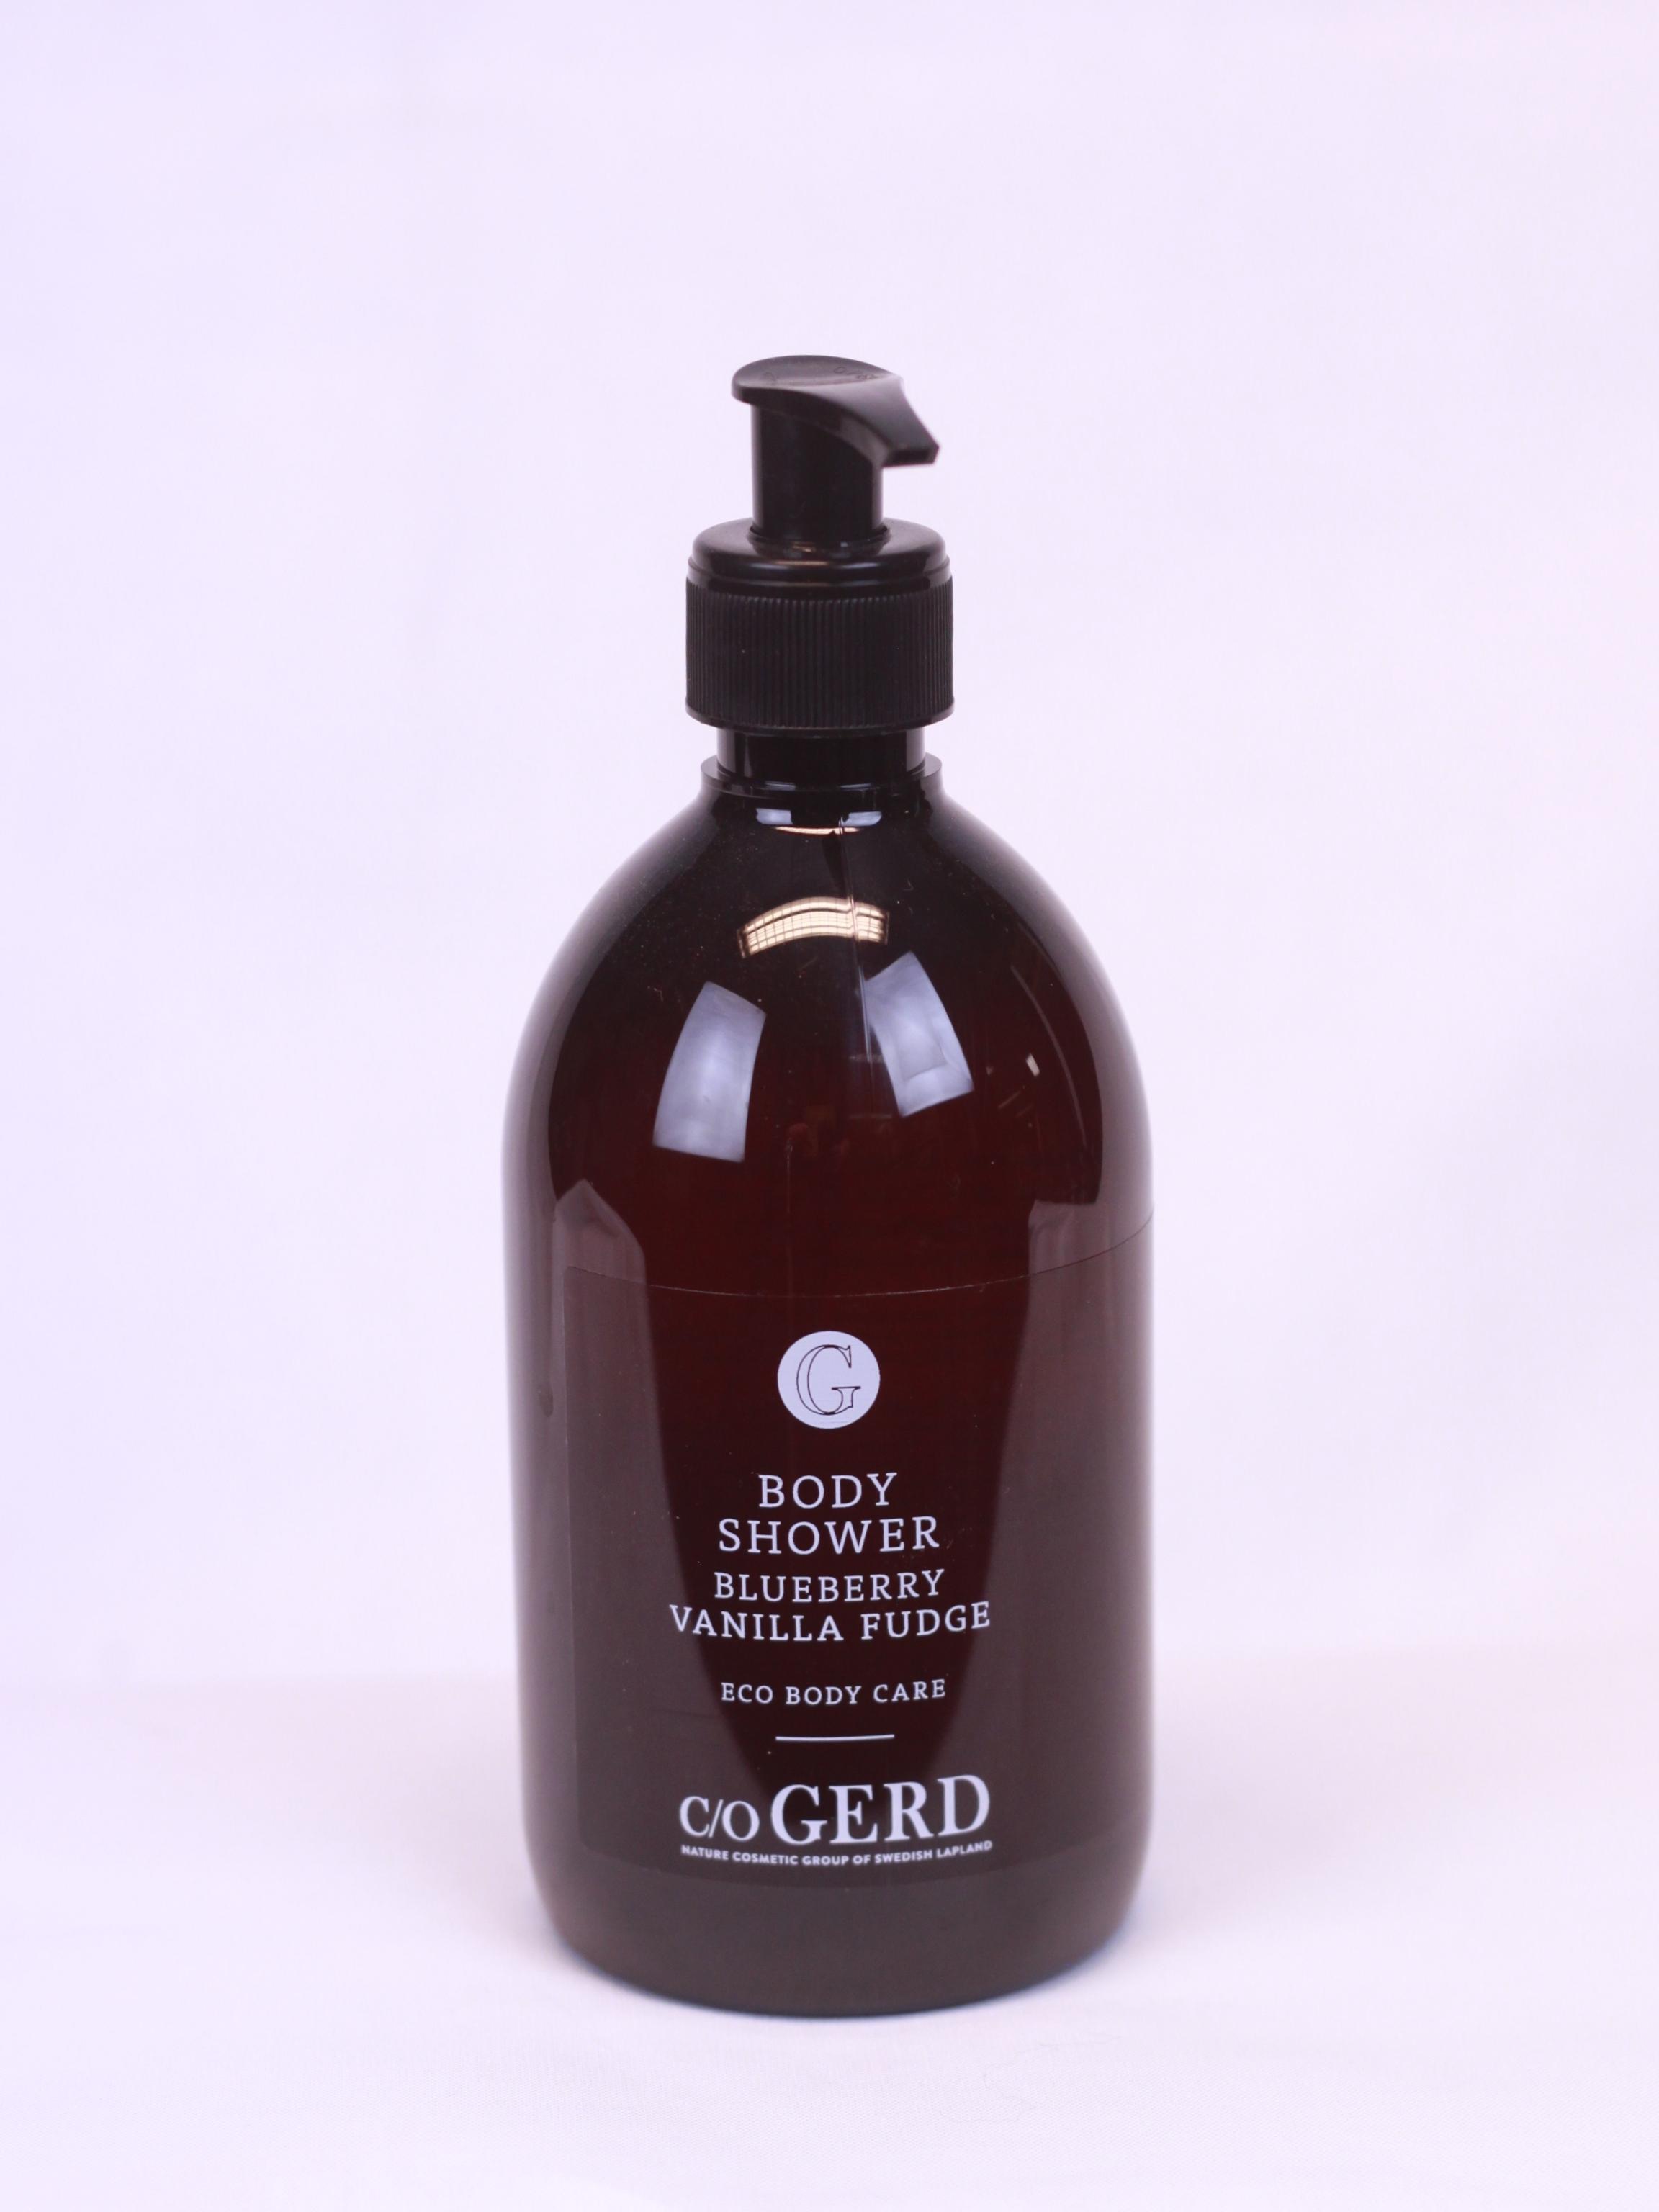 Body Shower Blueberry Vanilla Fudge